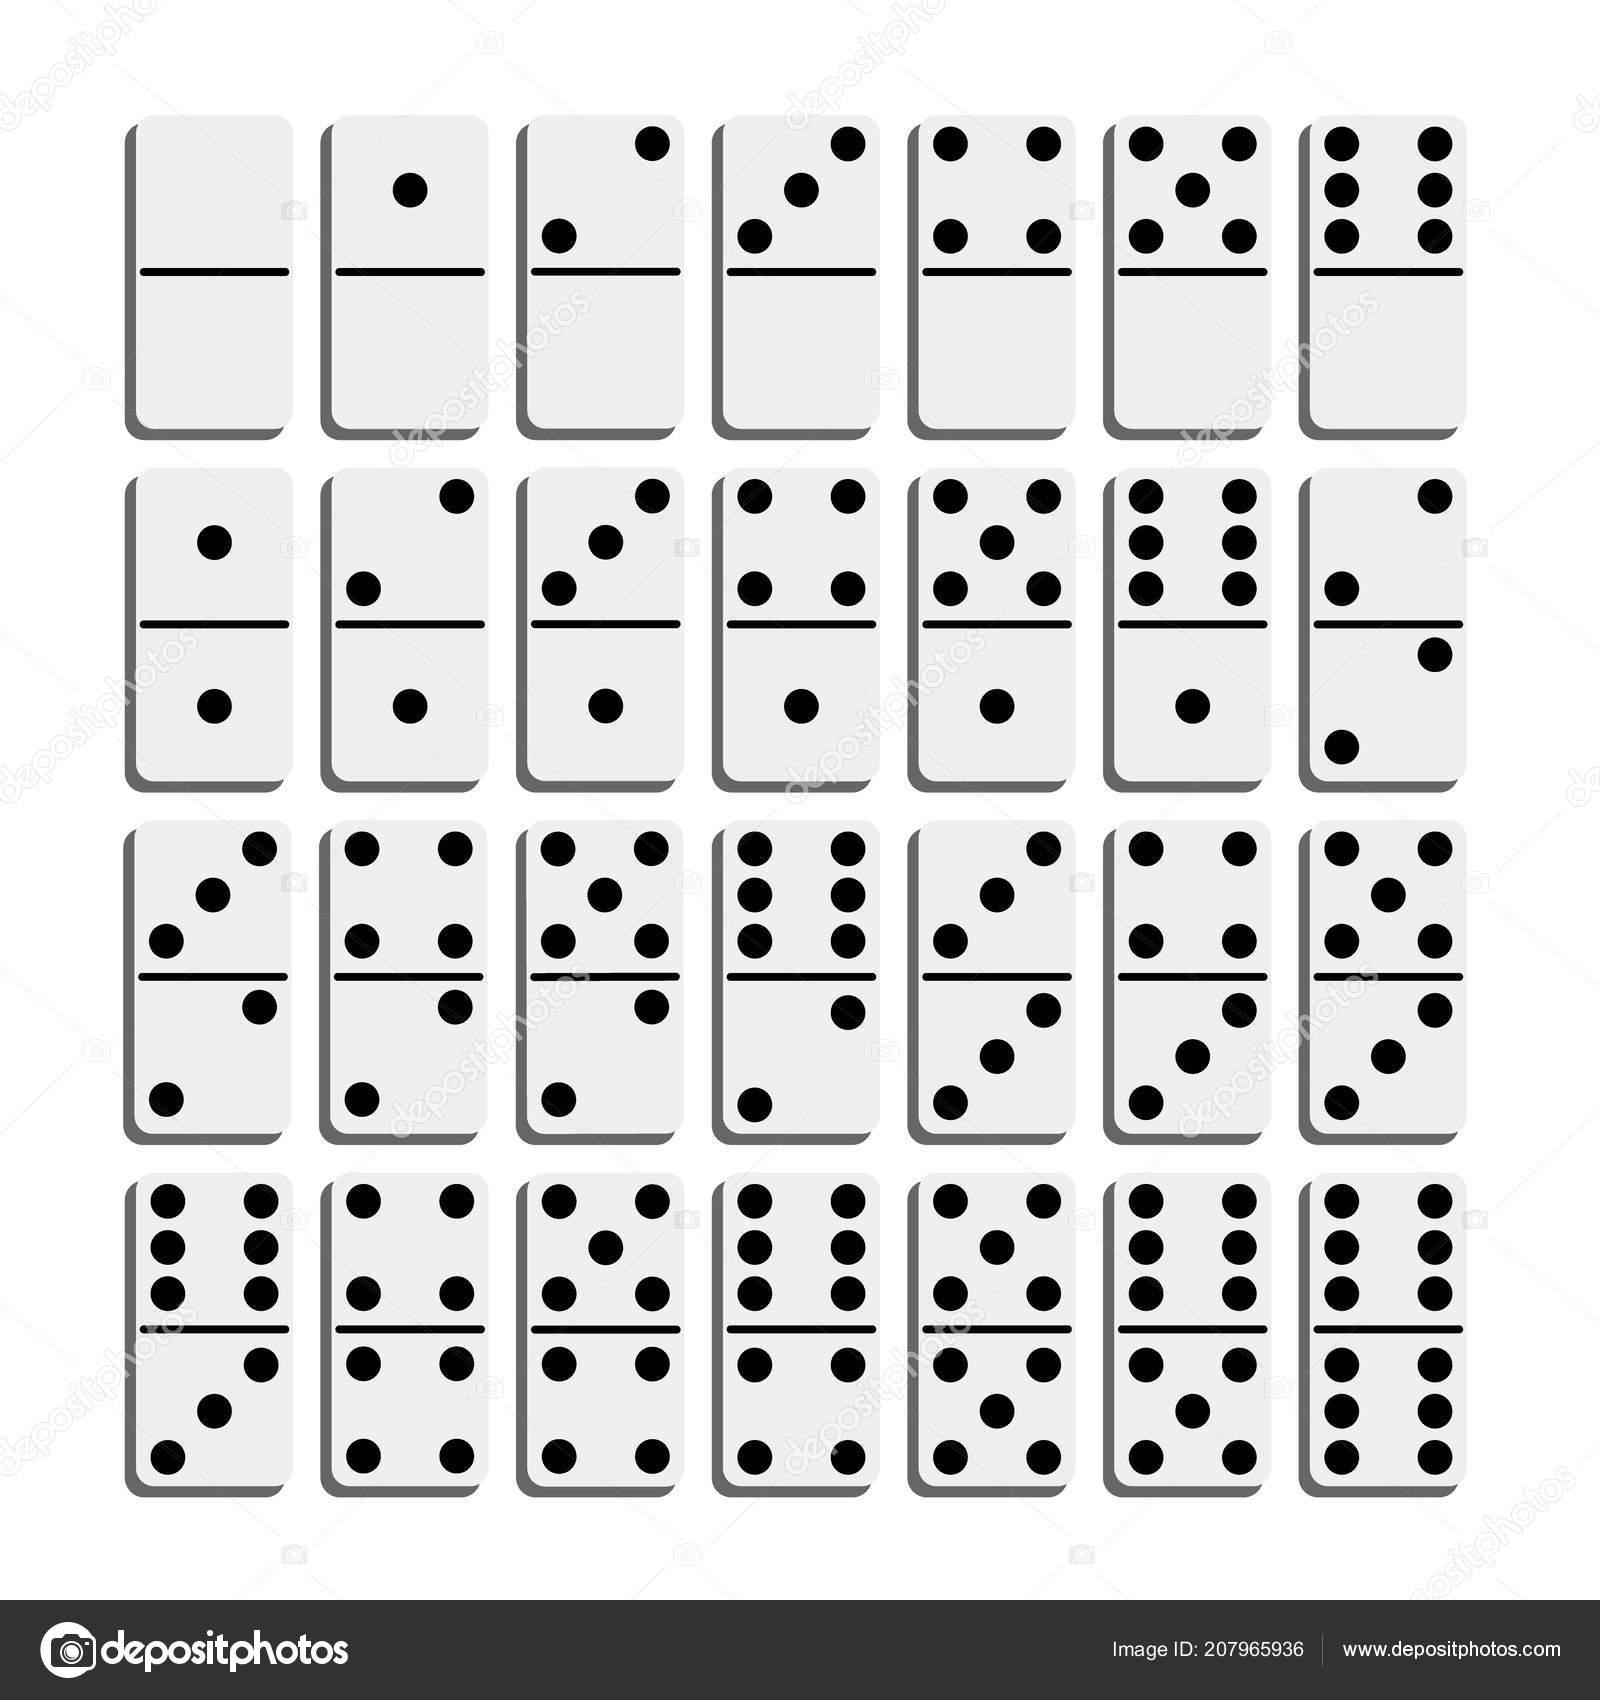 Creative Vector Illustration Of Realistic Domino Full Set